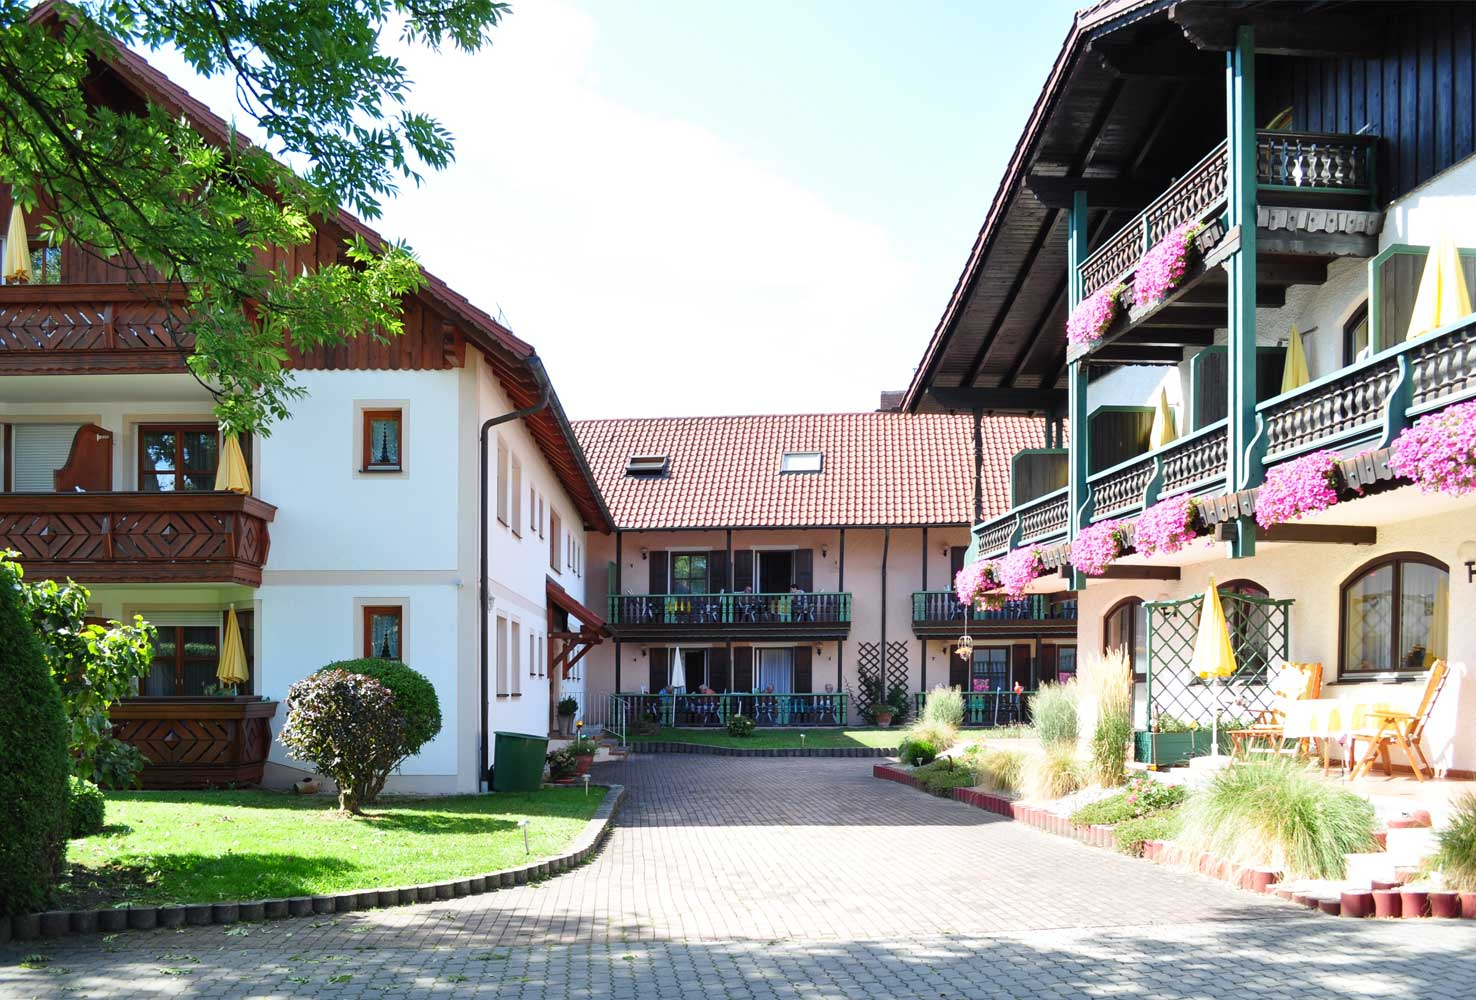 Landhaus Cornelia in Bad Birnbach